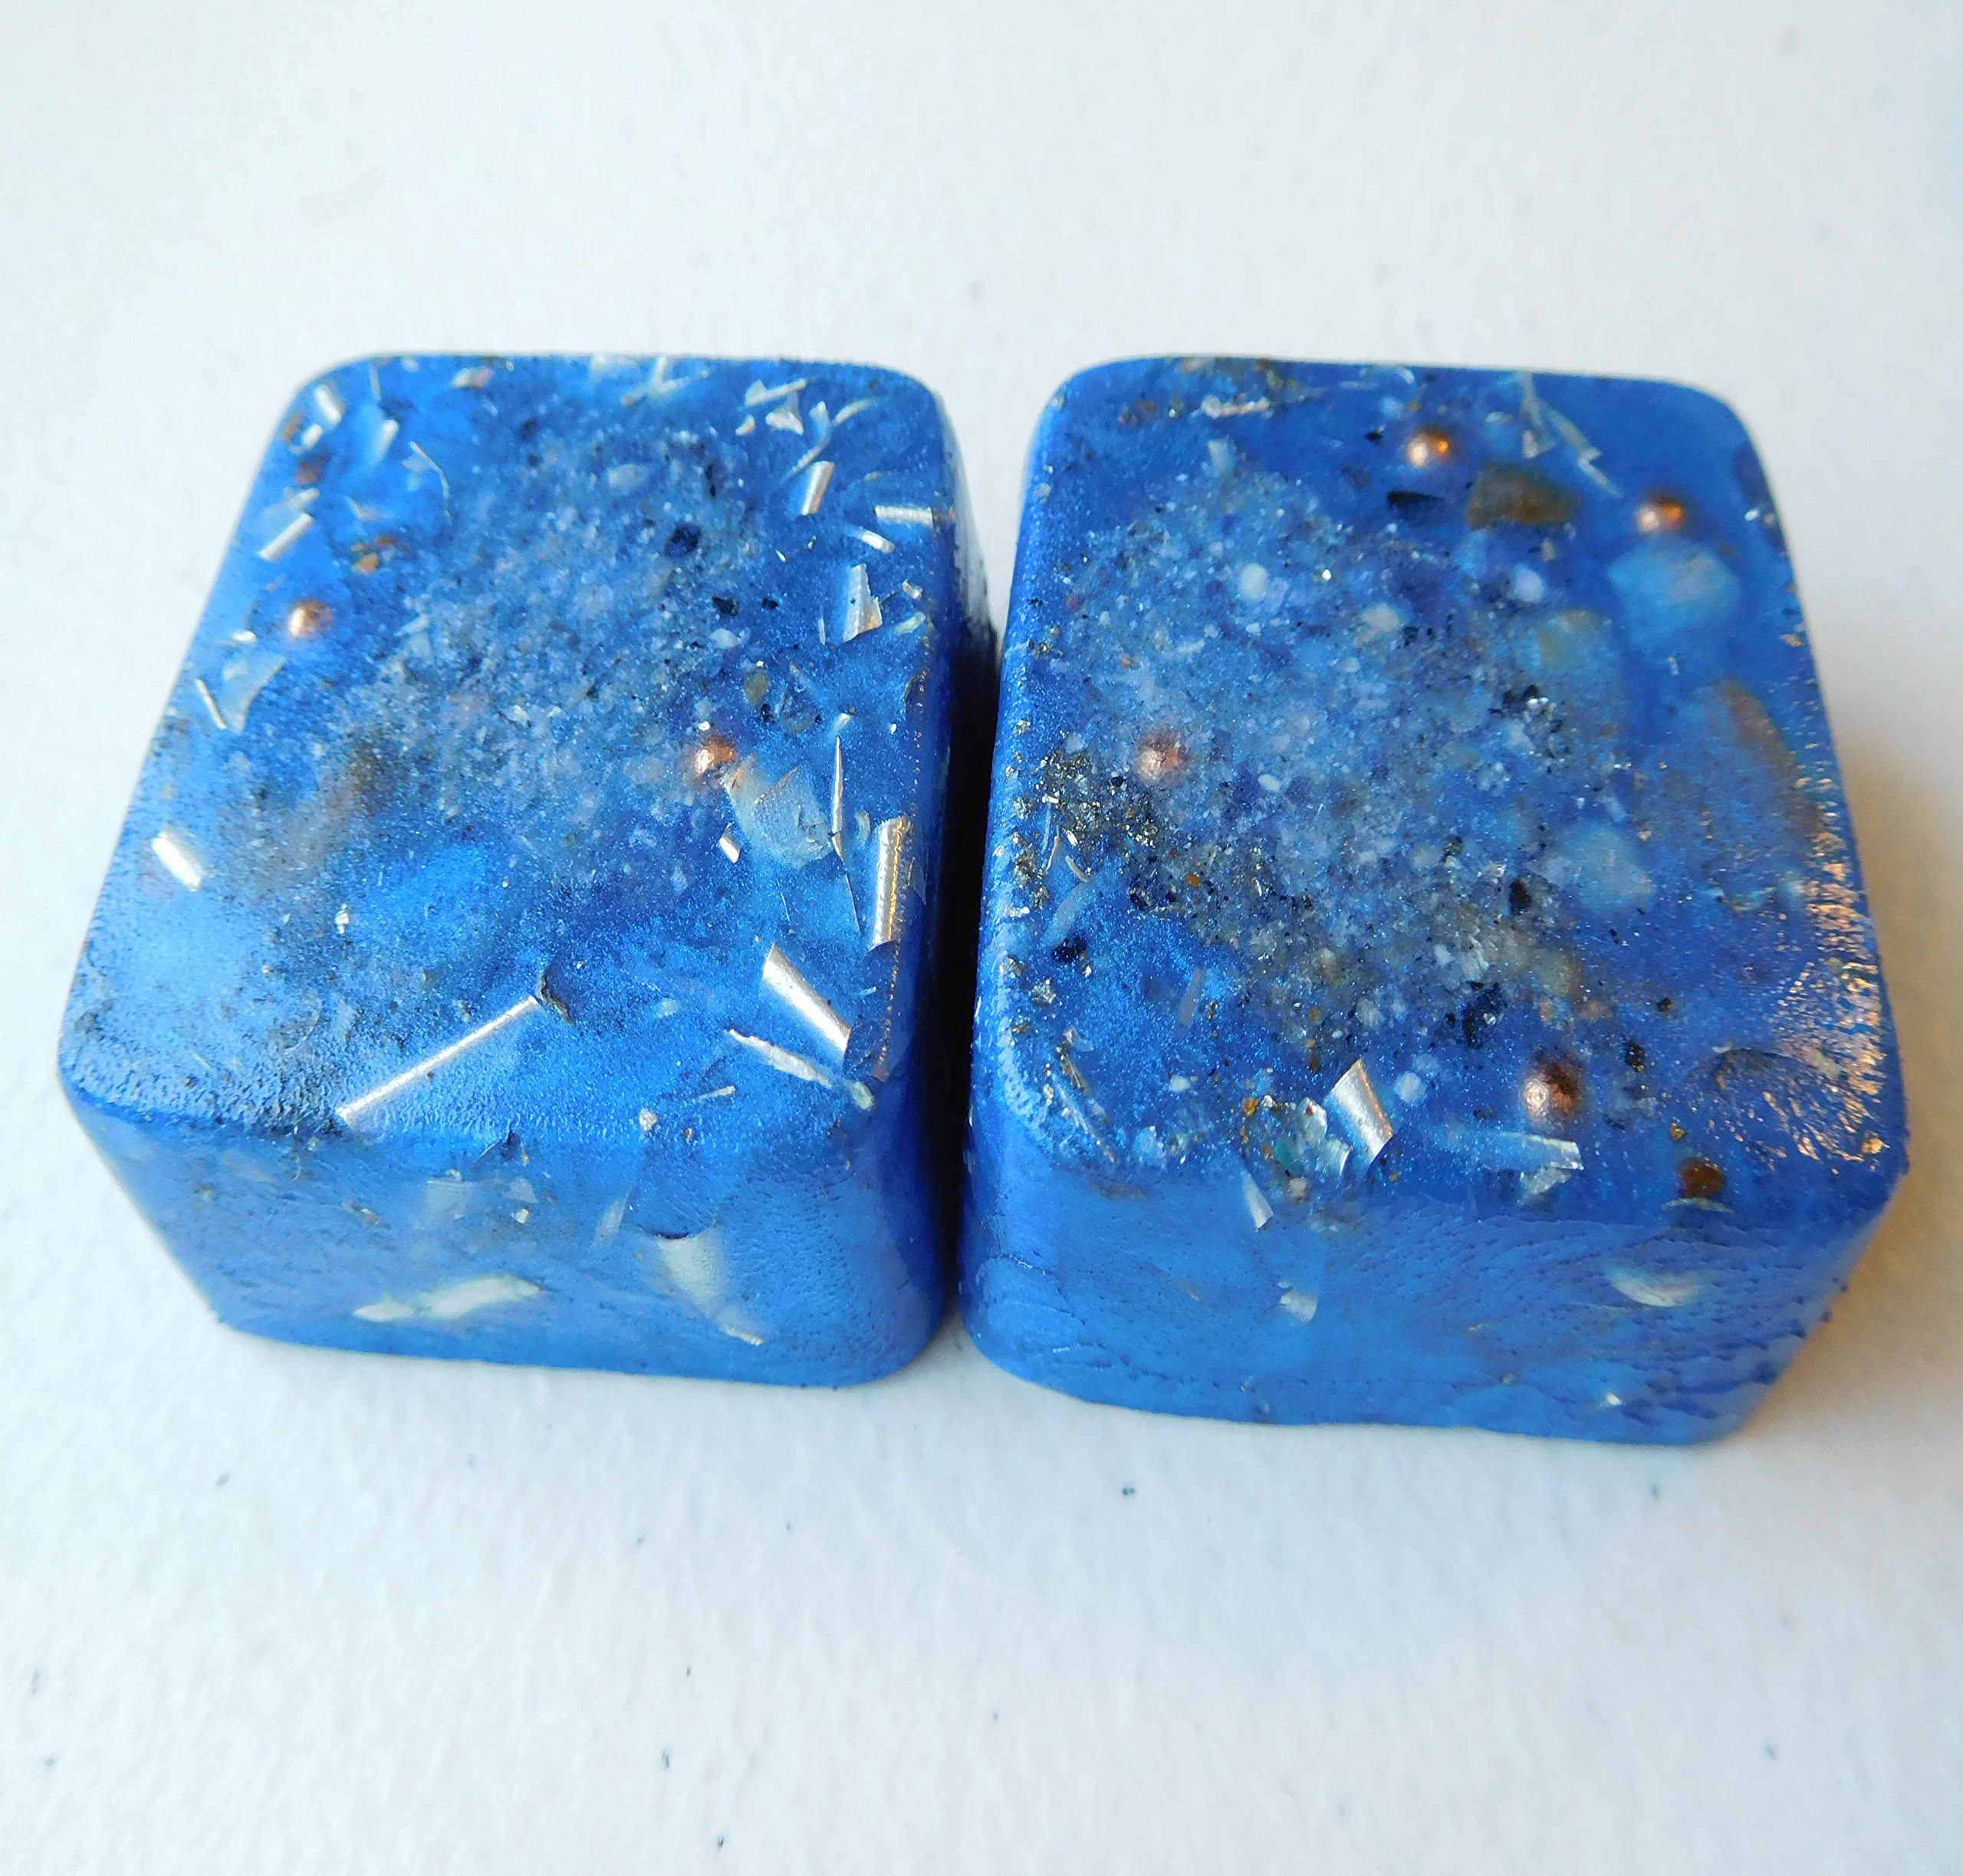 Tru Blue 2 Mini Cube Tower Busters Crystal Orgone Generator Energy Accumulator 528Hz/7.83Hz/Advance Harmonics Many Beautiful Ingredients and Colors!! (Tru Blue)